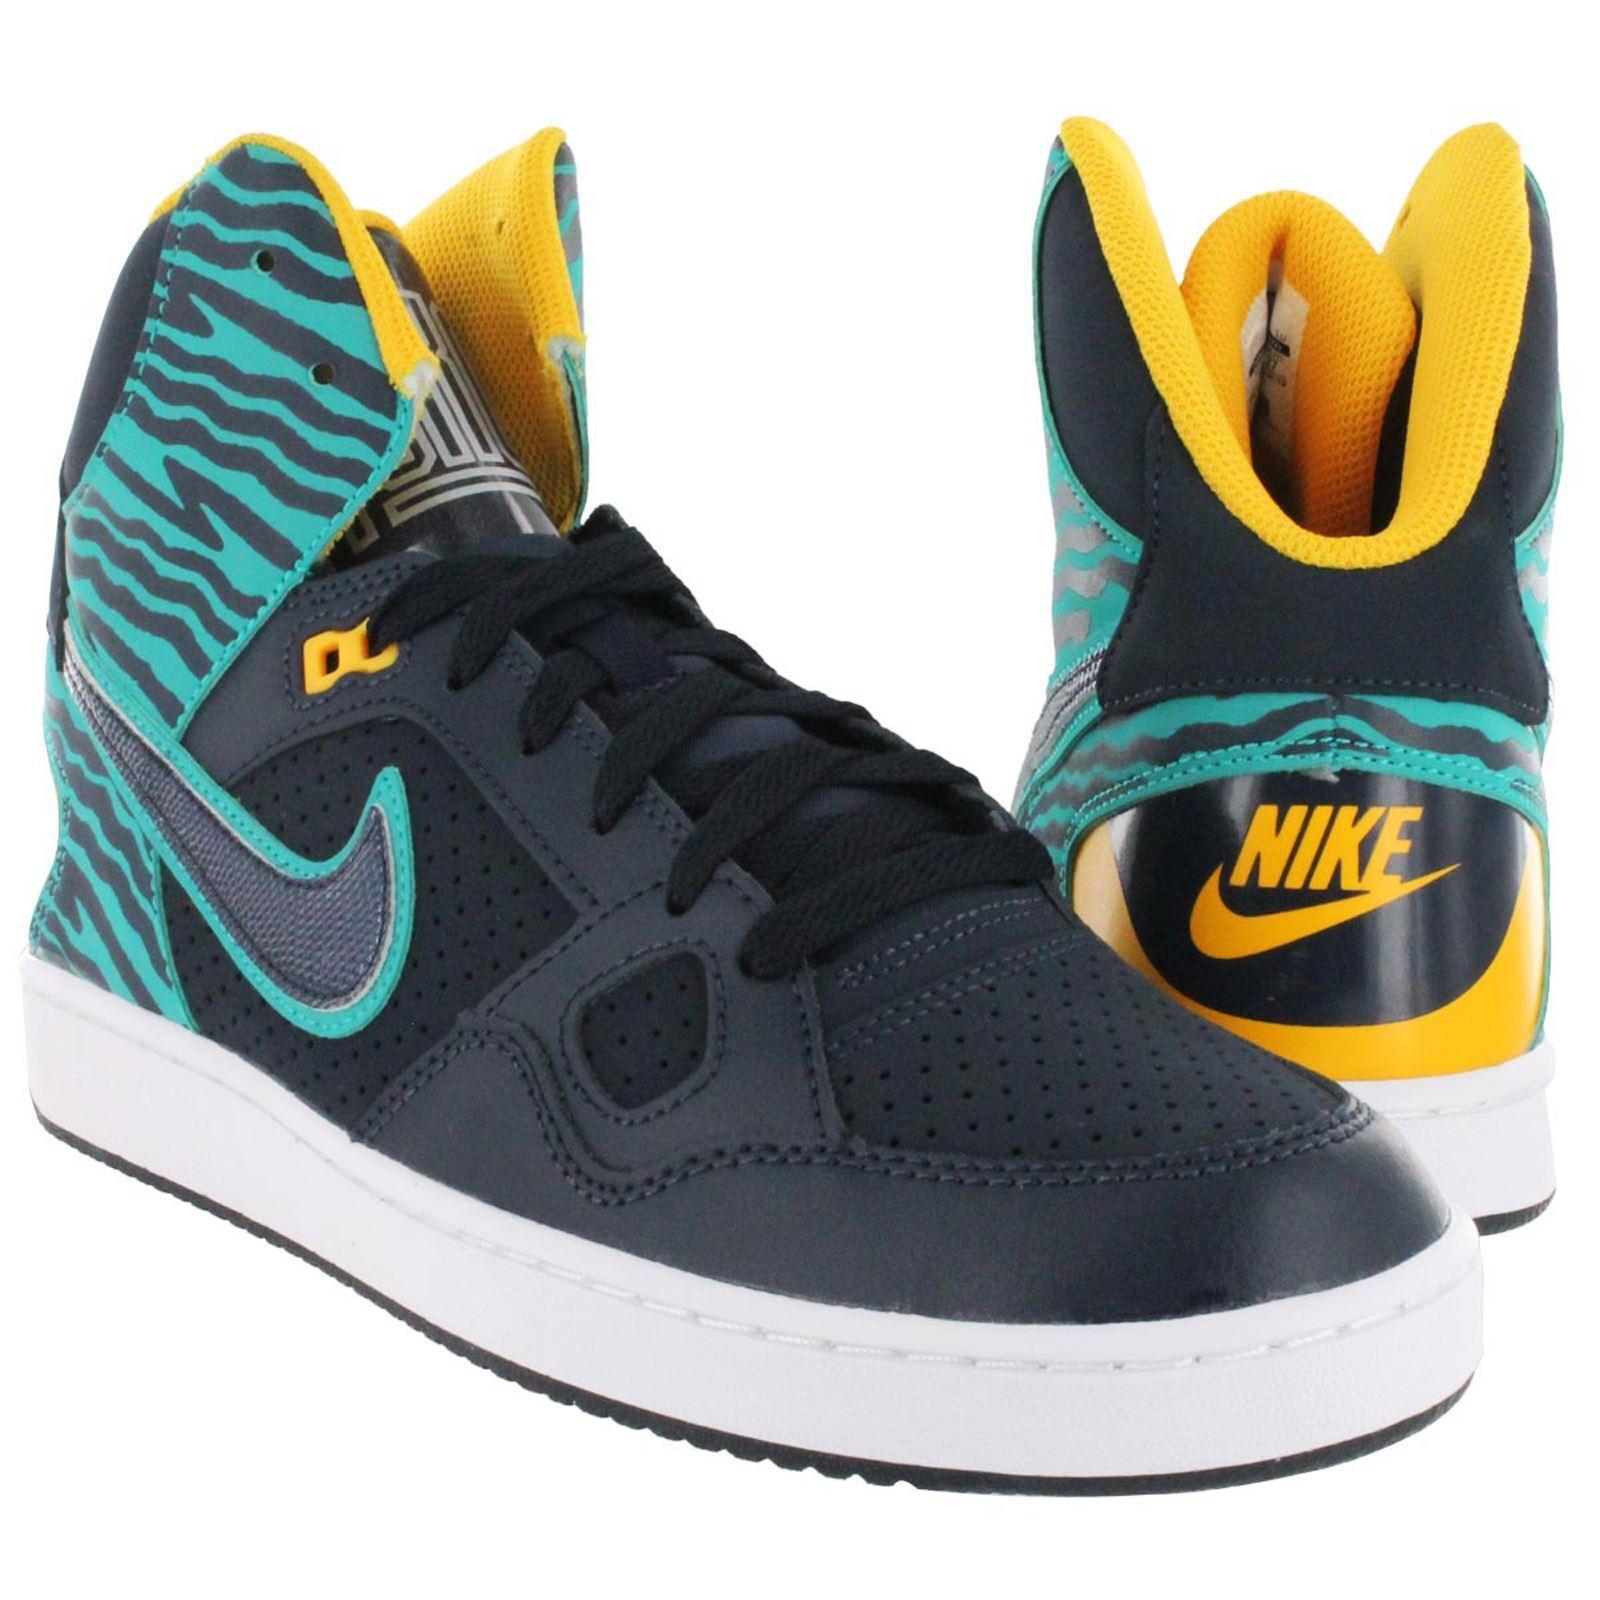 Nike Son of Force Force Force Mid Basketball scarpe -616281 401 SZ 9 e6dfb3